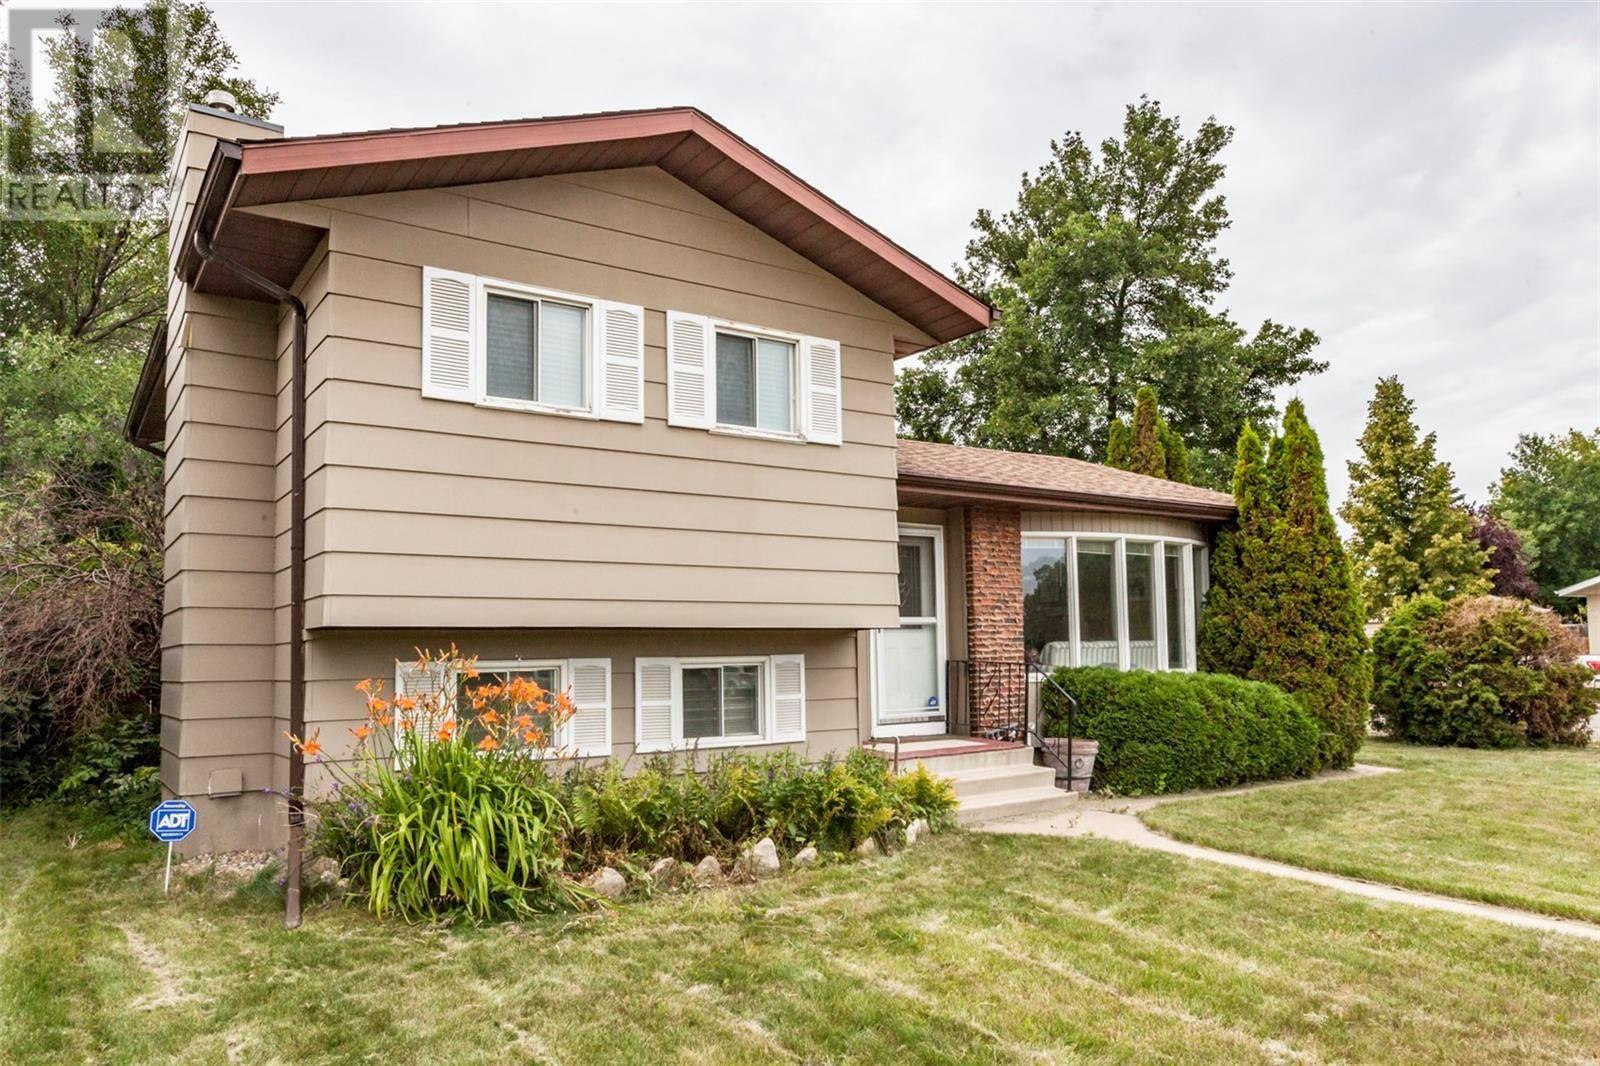 House for sale at 1502 Mckercher Dr Saskatoon Saskatchewan - MLS: SK783138